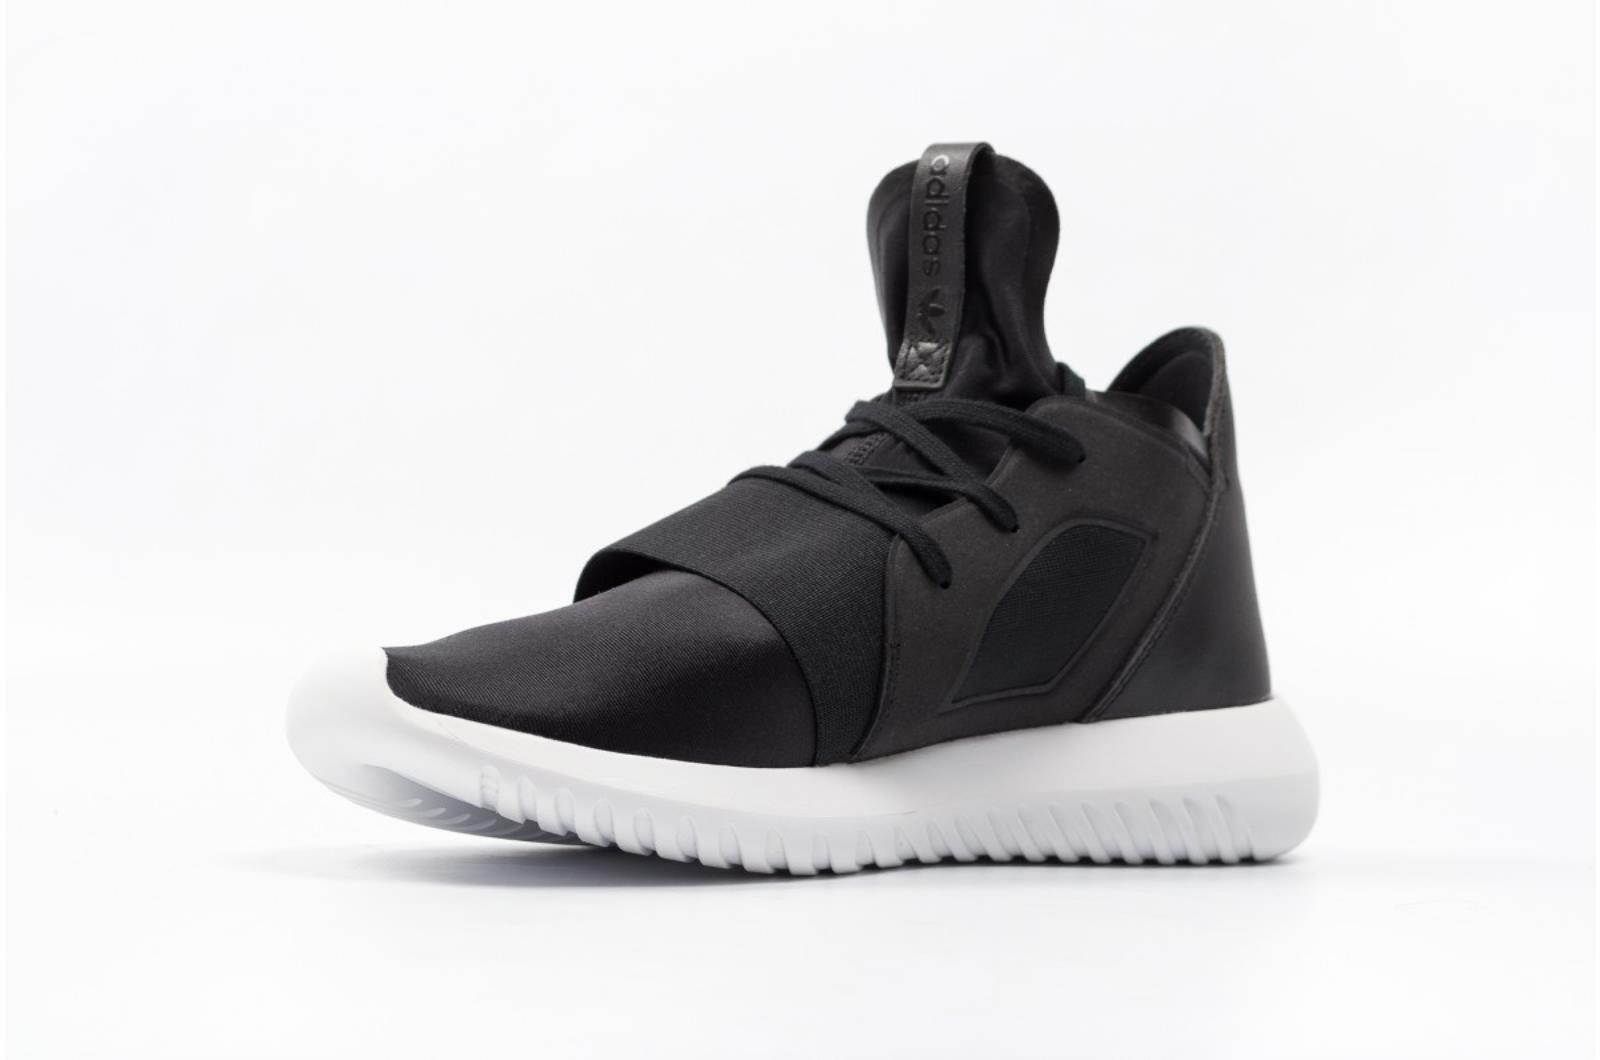 Adidas Originals Tubular Defiant Women's Black/Black/White S75249  Comfortable